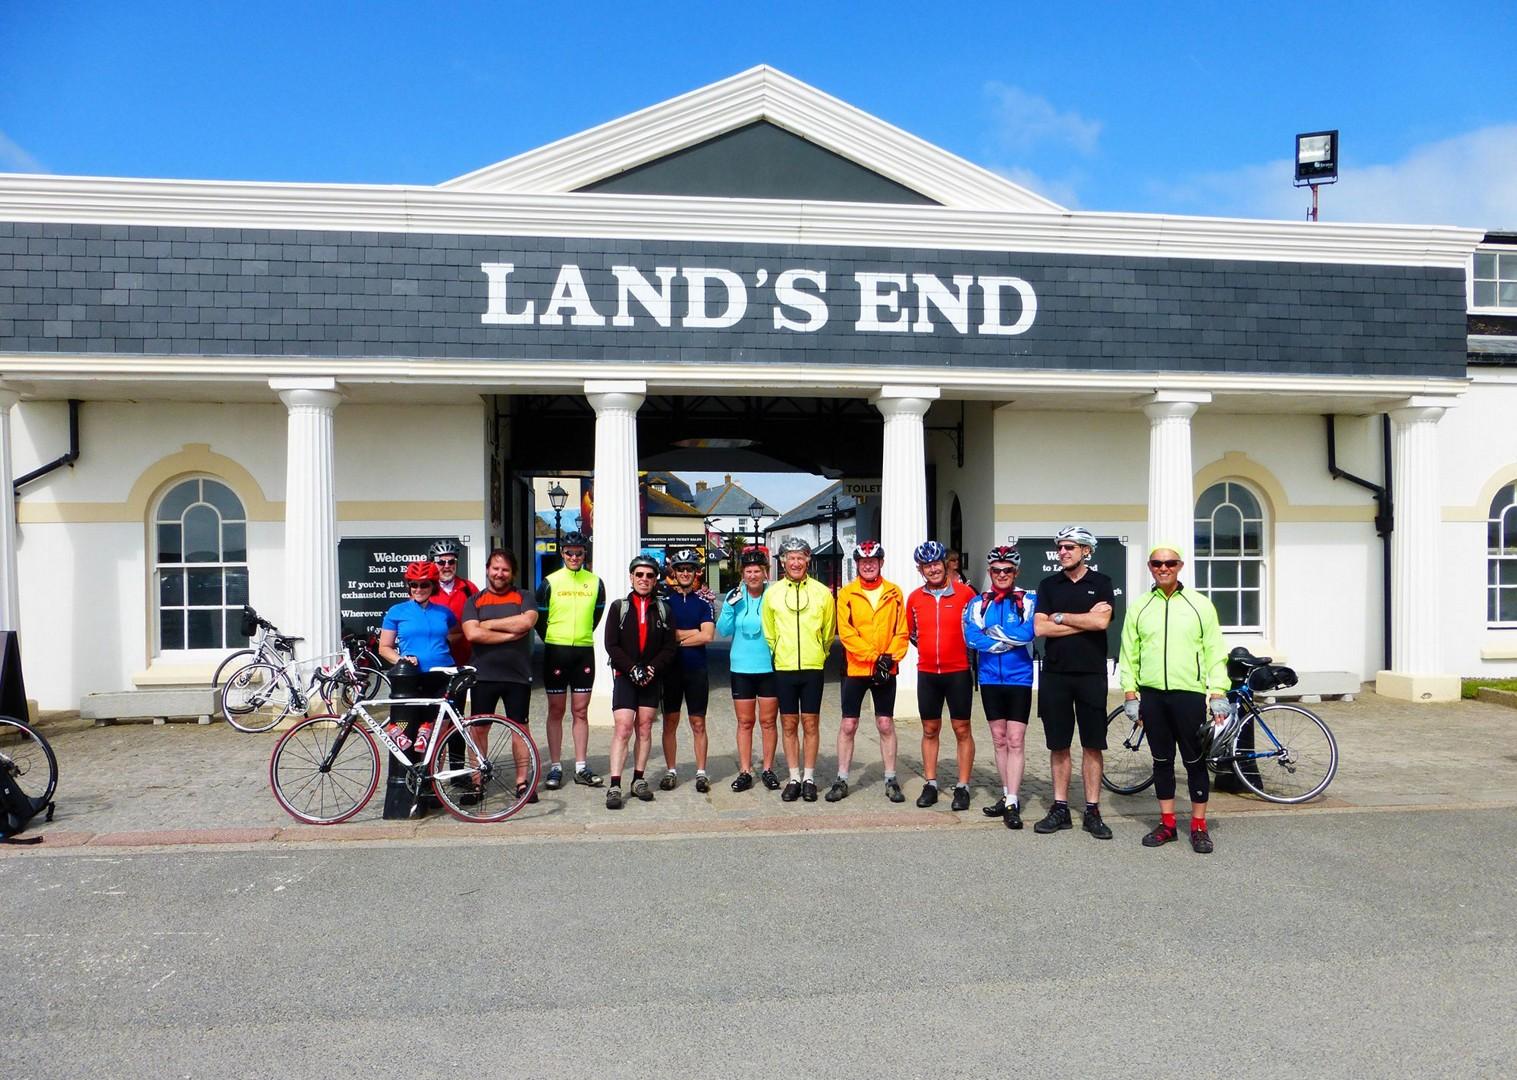 cycling-holiday-sustrans-lands-end-to-john-ogroats-lejog.jpg - UK - Land's End to John O'Groats Explorer (22 days) - Guided Cycling Holiday - Road Cycling